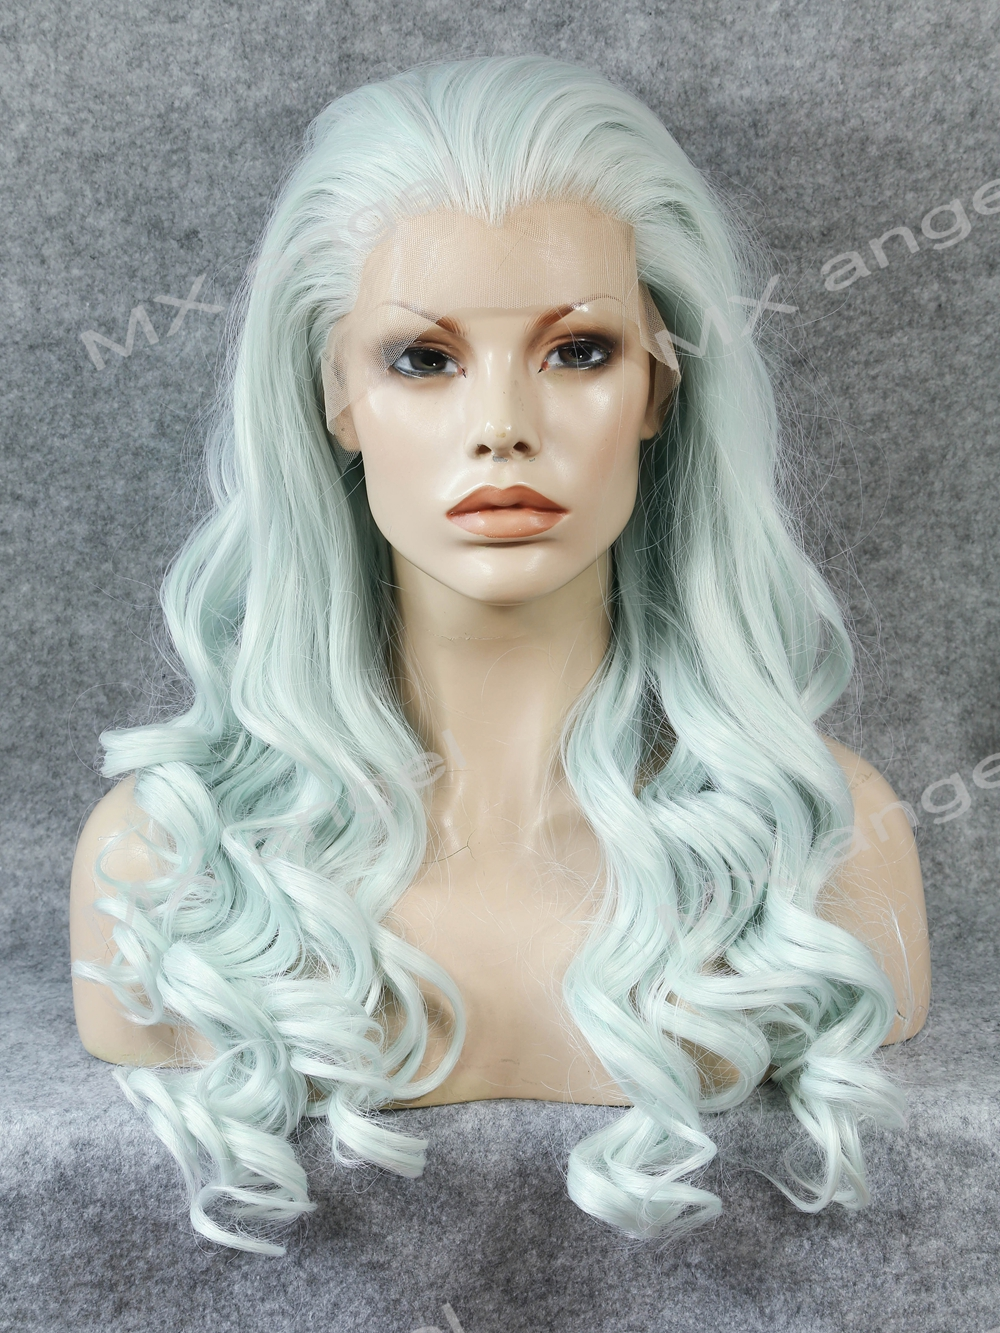 K07 Cheap 26inch Wavy Light Blue Color Synthetic Lace Front Wigs Heat Resistant Heavy Density kanekalon